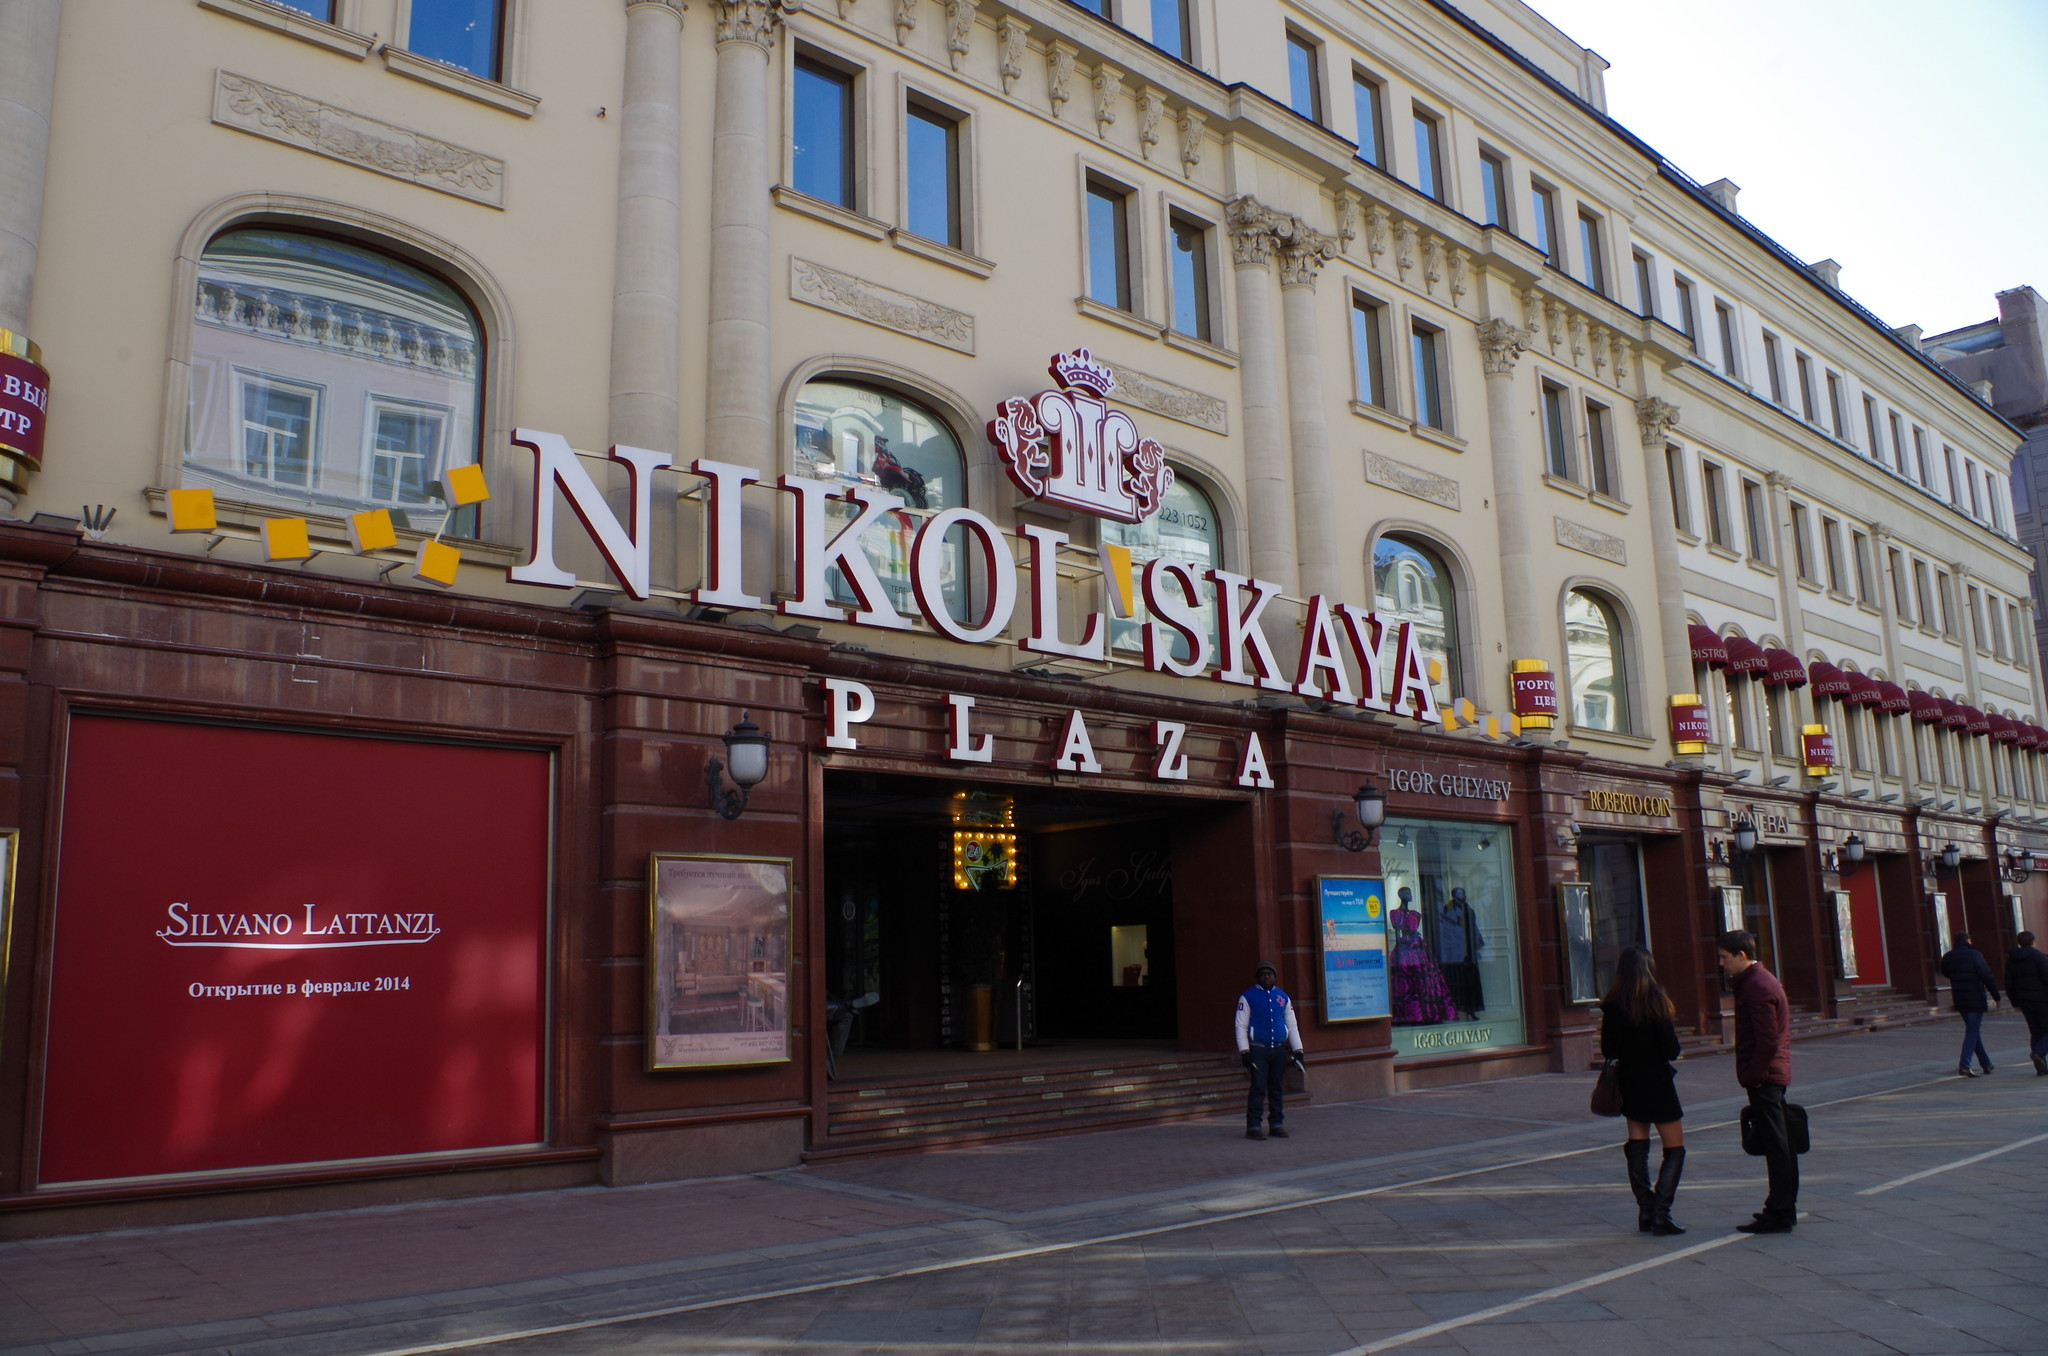 ТЦ Nikolskaya Plaza ( Никольская Плаза). Москва, Никольская улица, дом 10